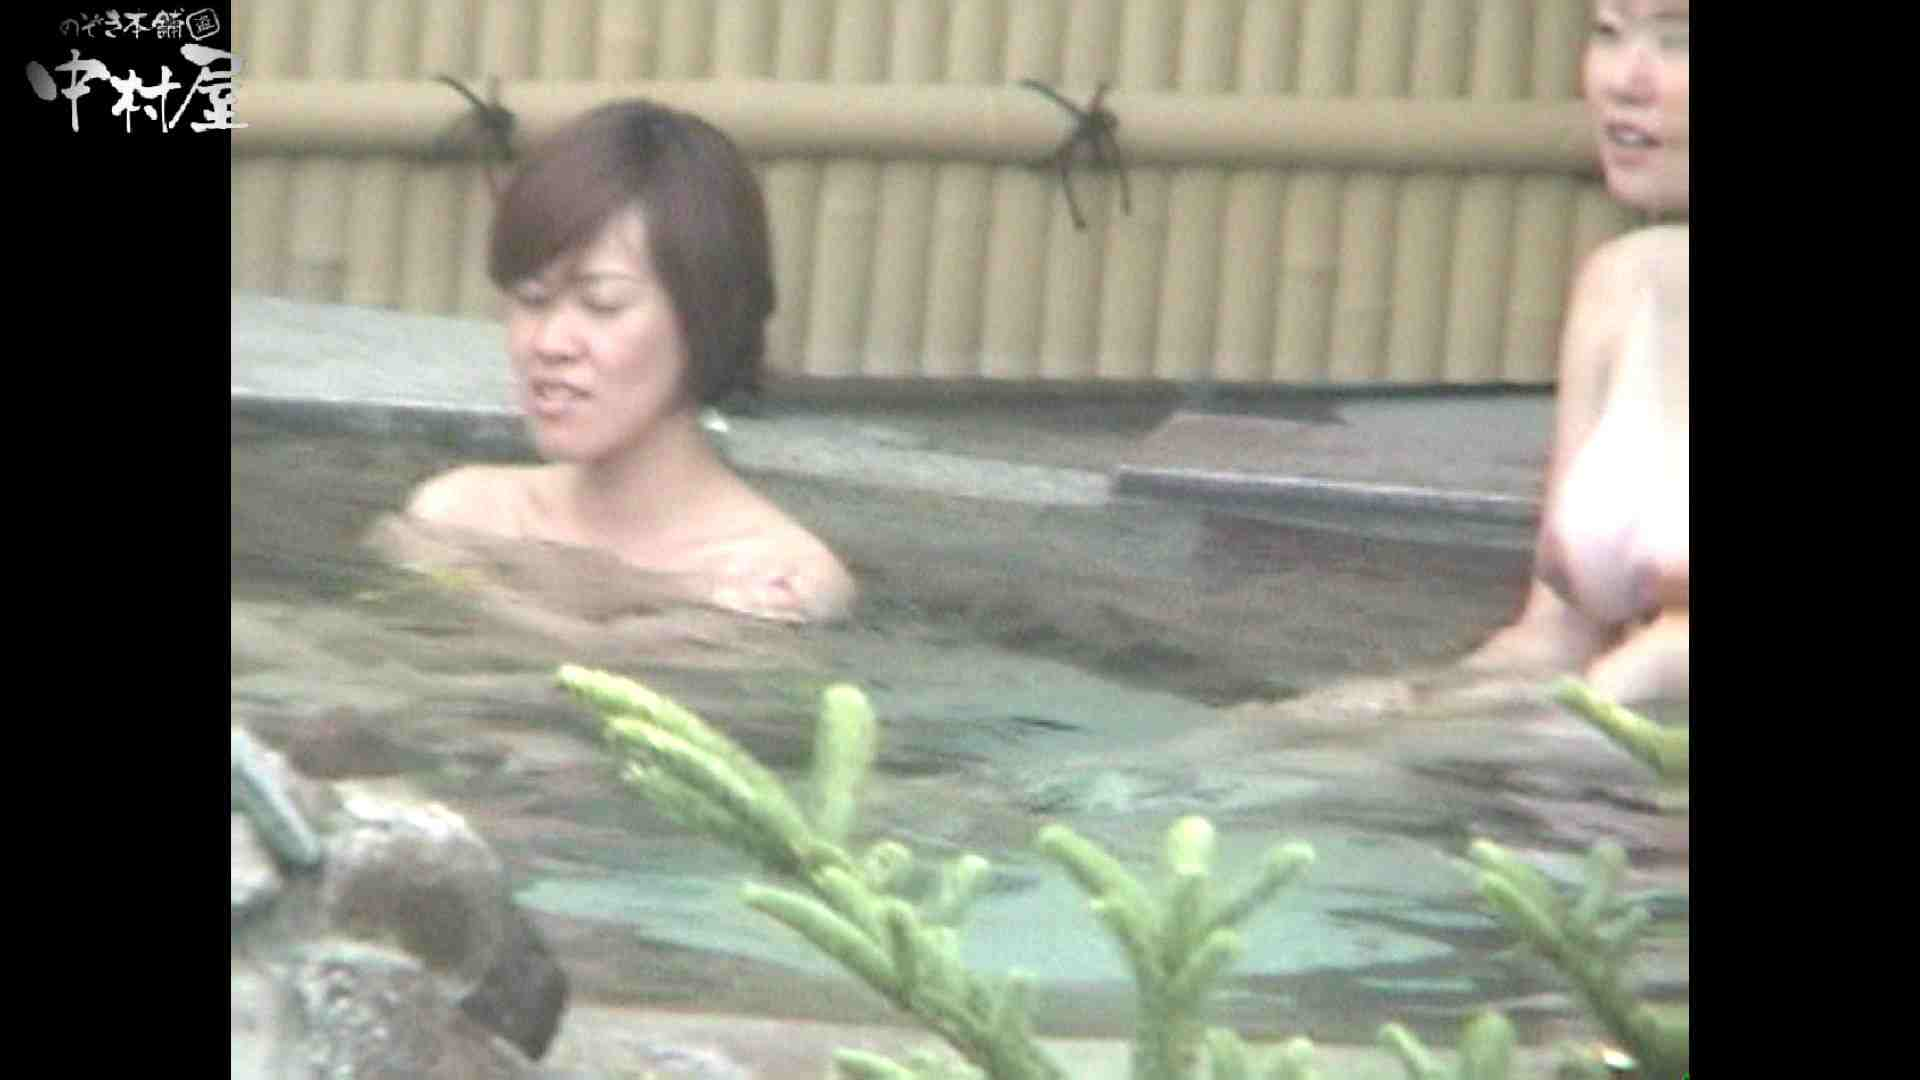 Aquaな露天風呂Vol.961 露天風呂 | OLのエロ生活  104連発 1